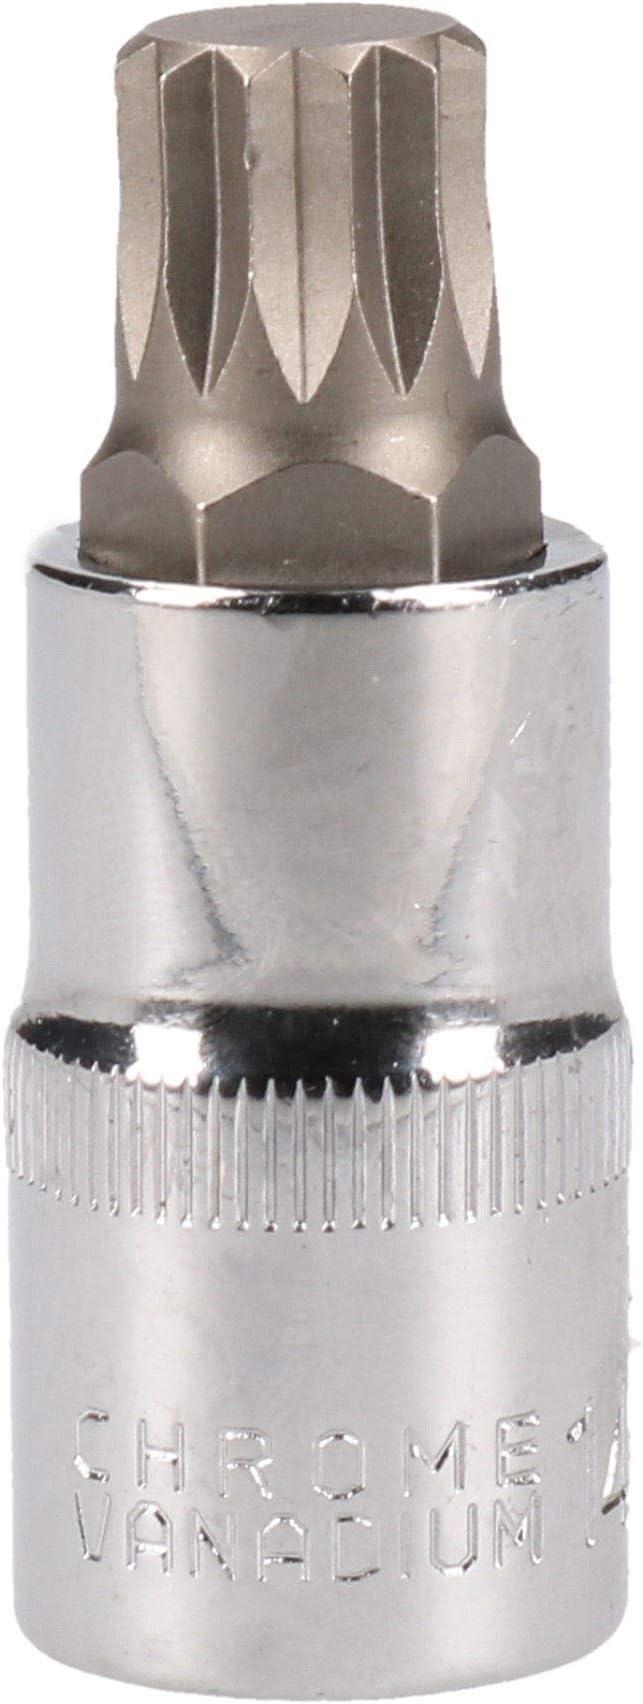 "M14 x 55mm 1//2/"" Drive Shallow Stubby Spline Triple Square Male Socket"